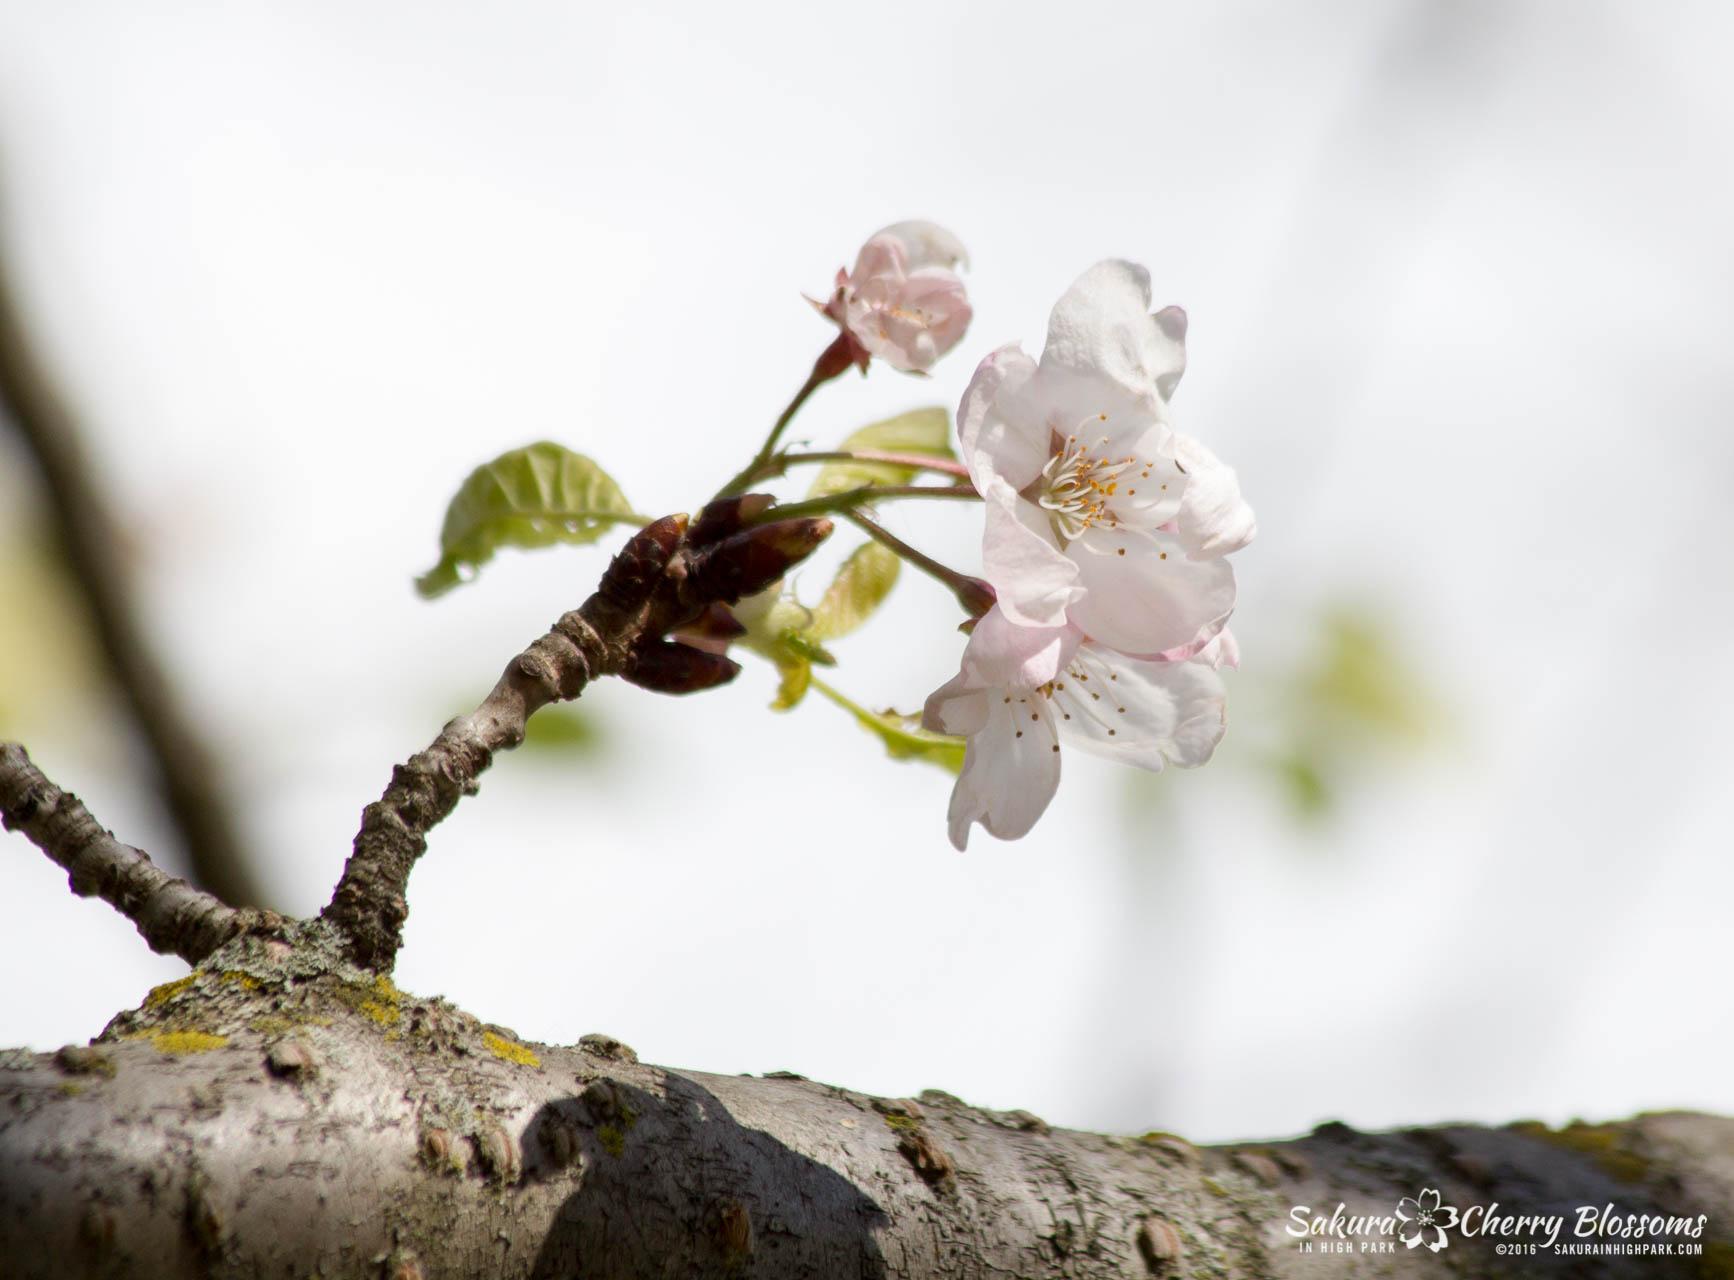 SakurainHighPark-May13-2016-281.jpg